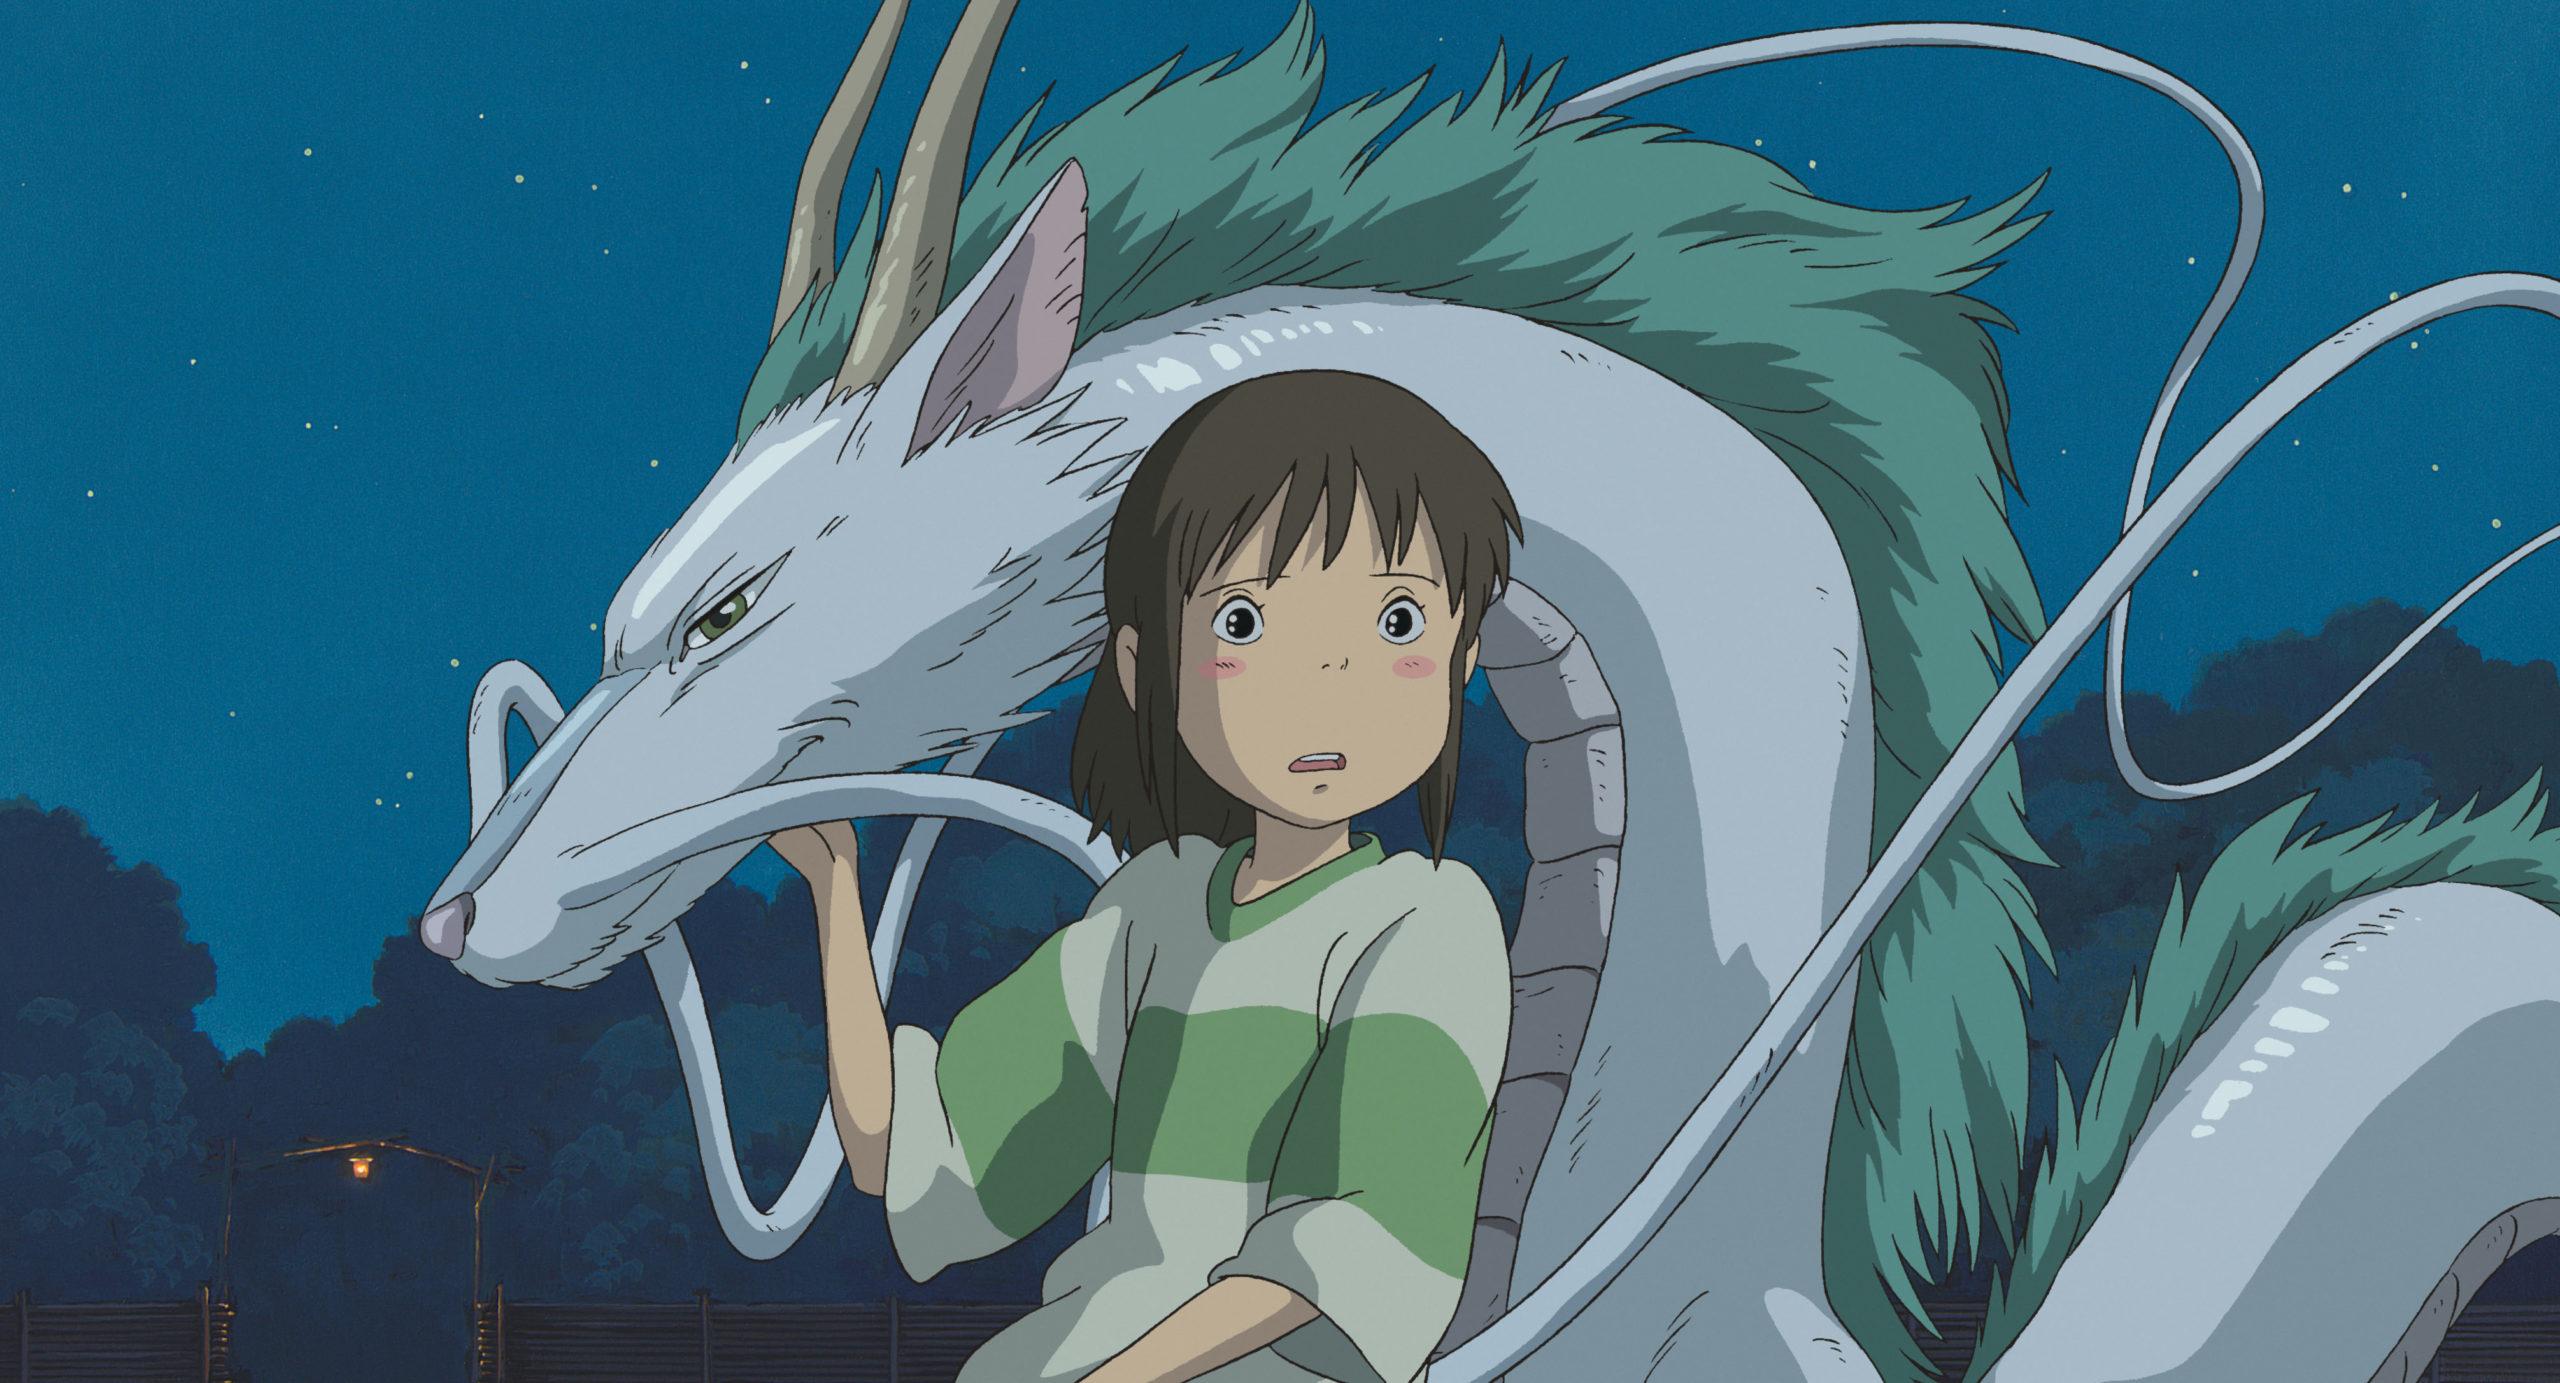 A viaxe de Chihiro